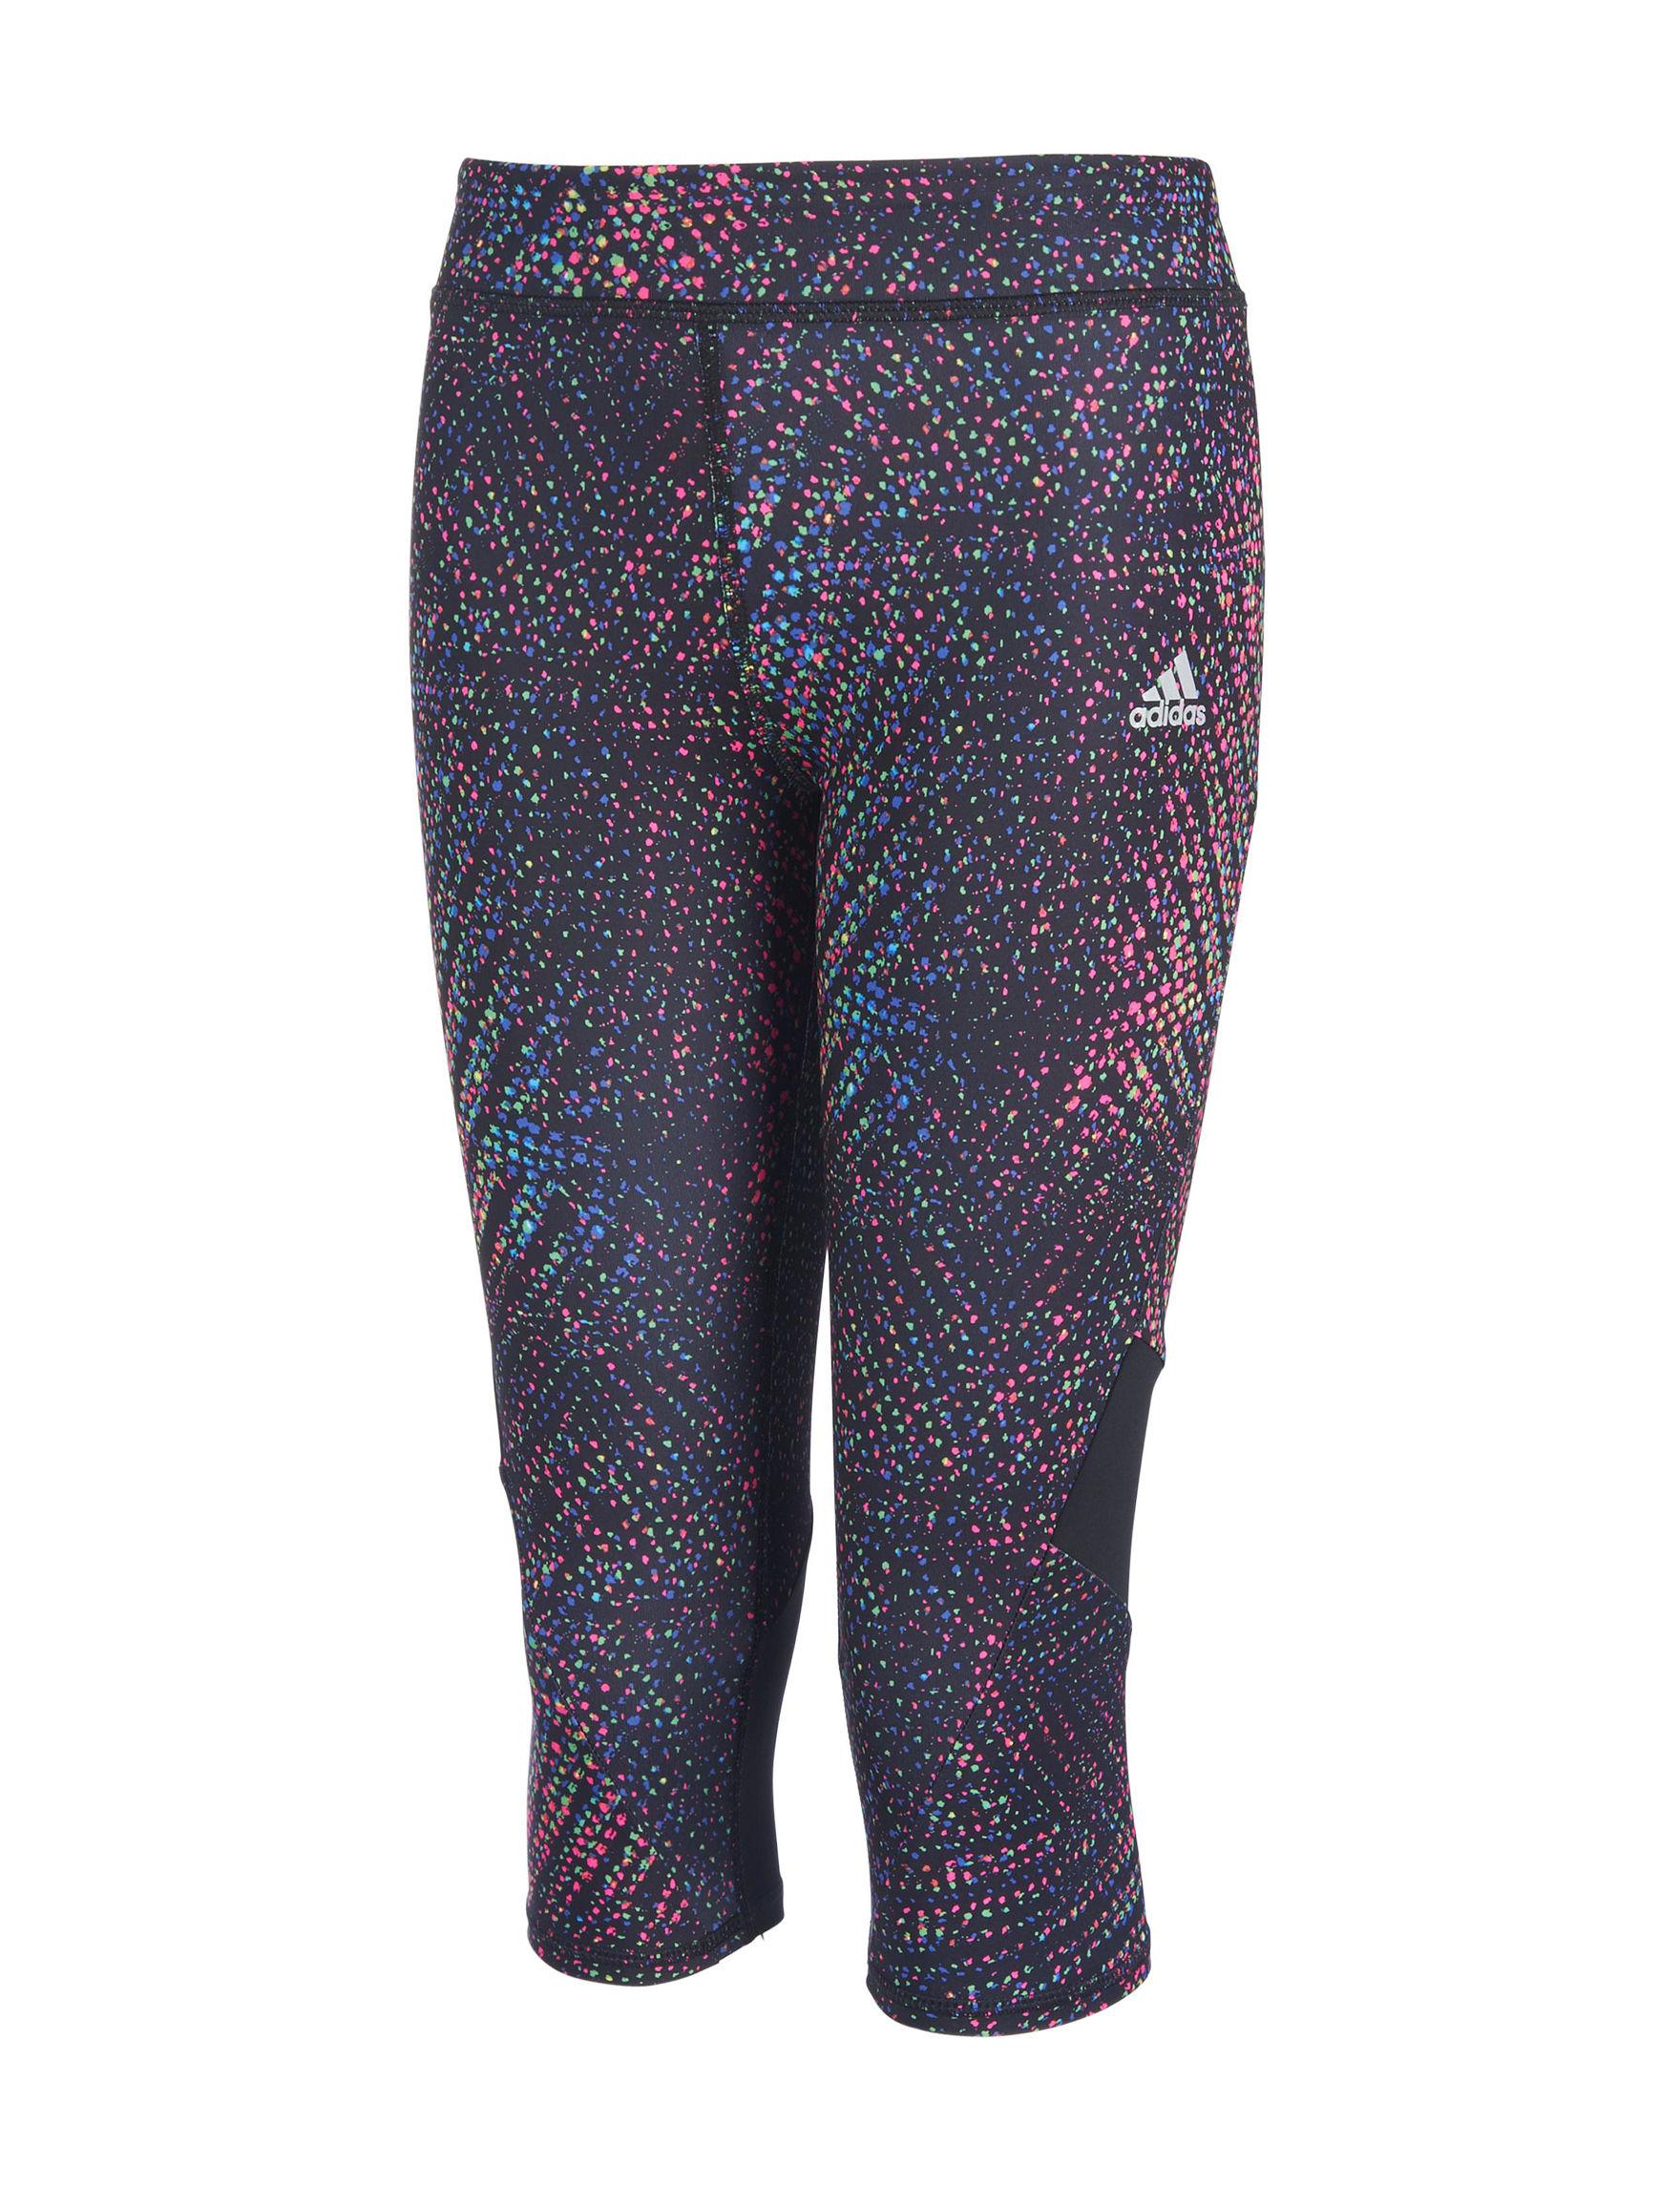 Adidas Black Multi Leggings